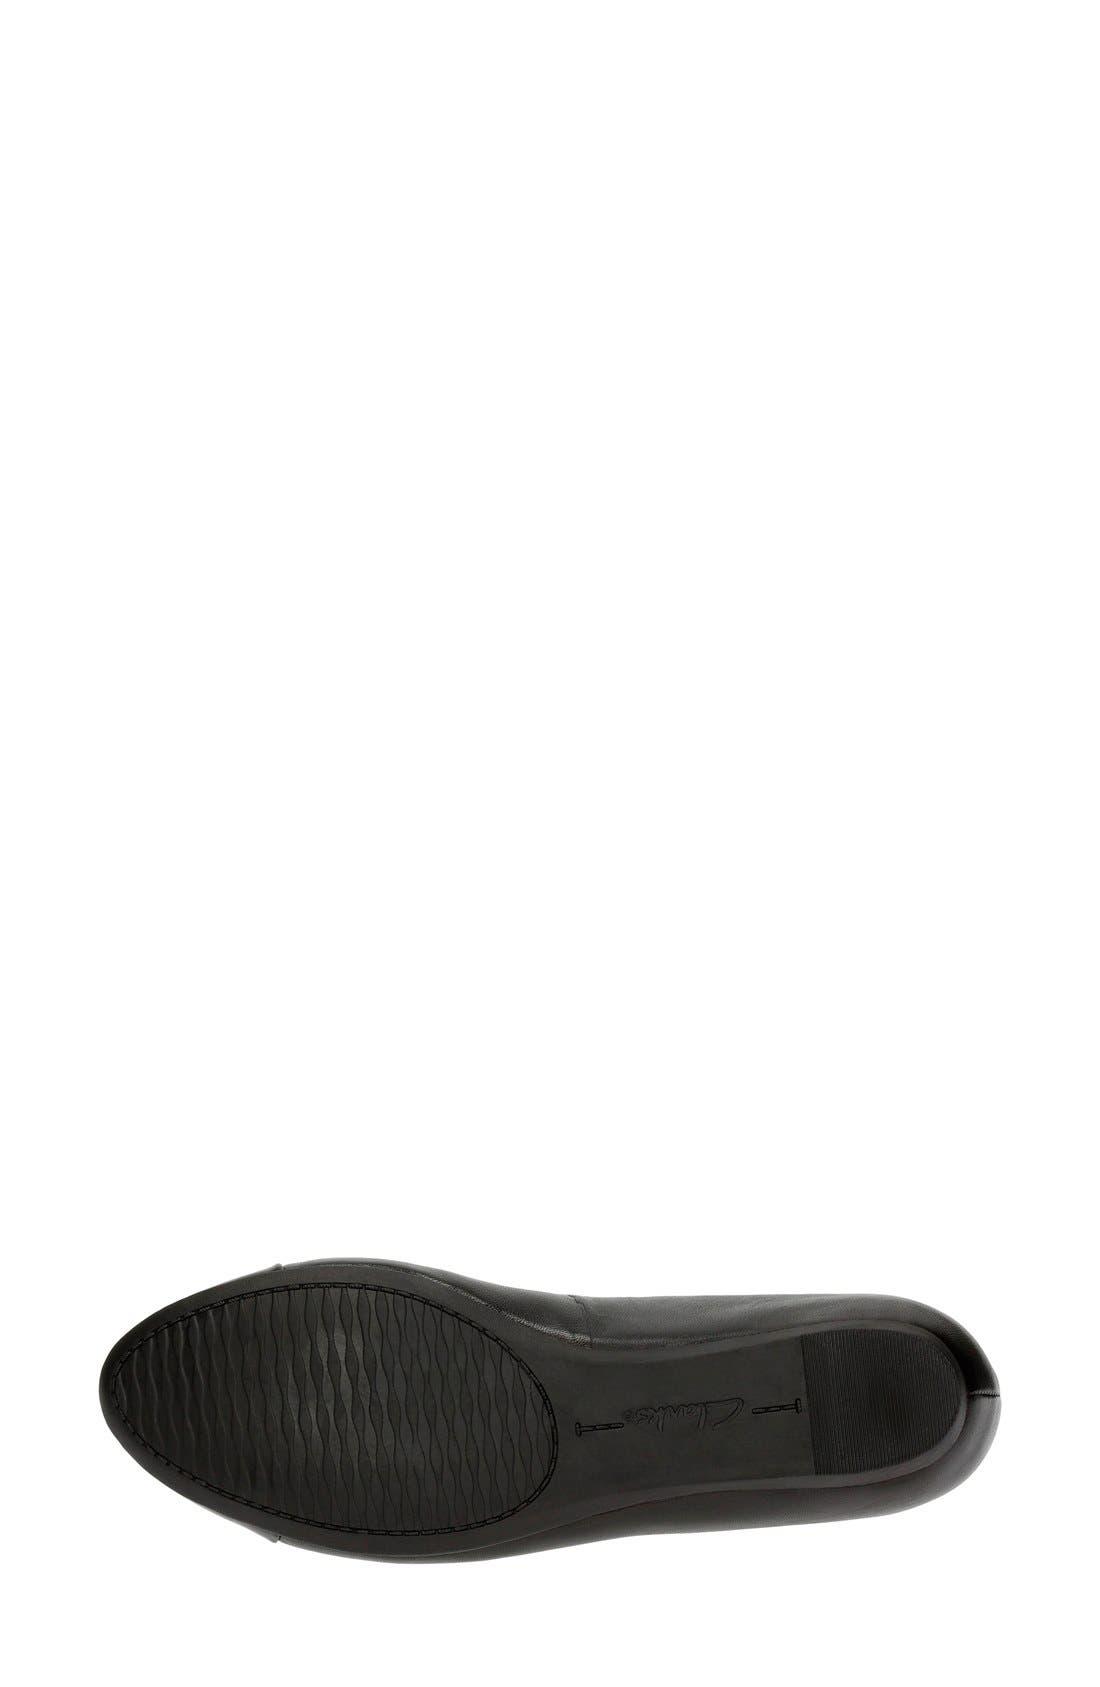 Alternate Image 4  - Clarks® 'Alitay Susan' Cap Toe Flat (Women)